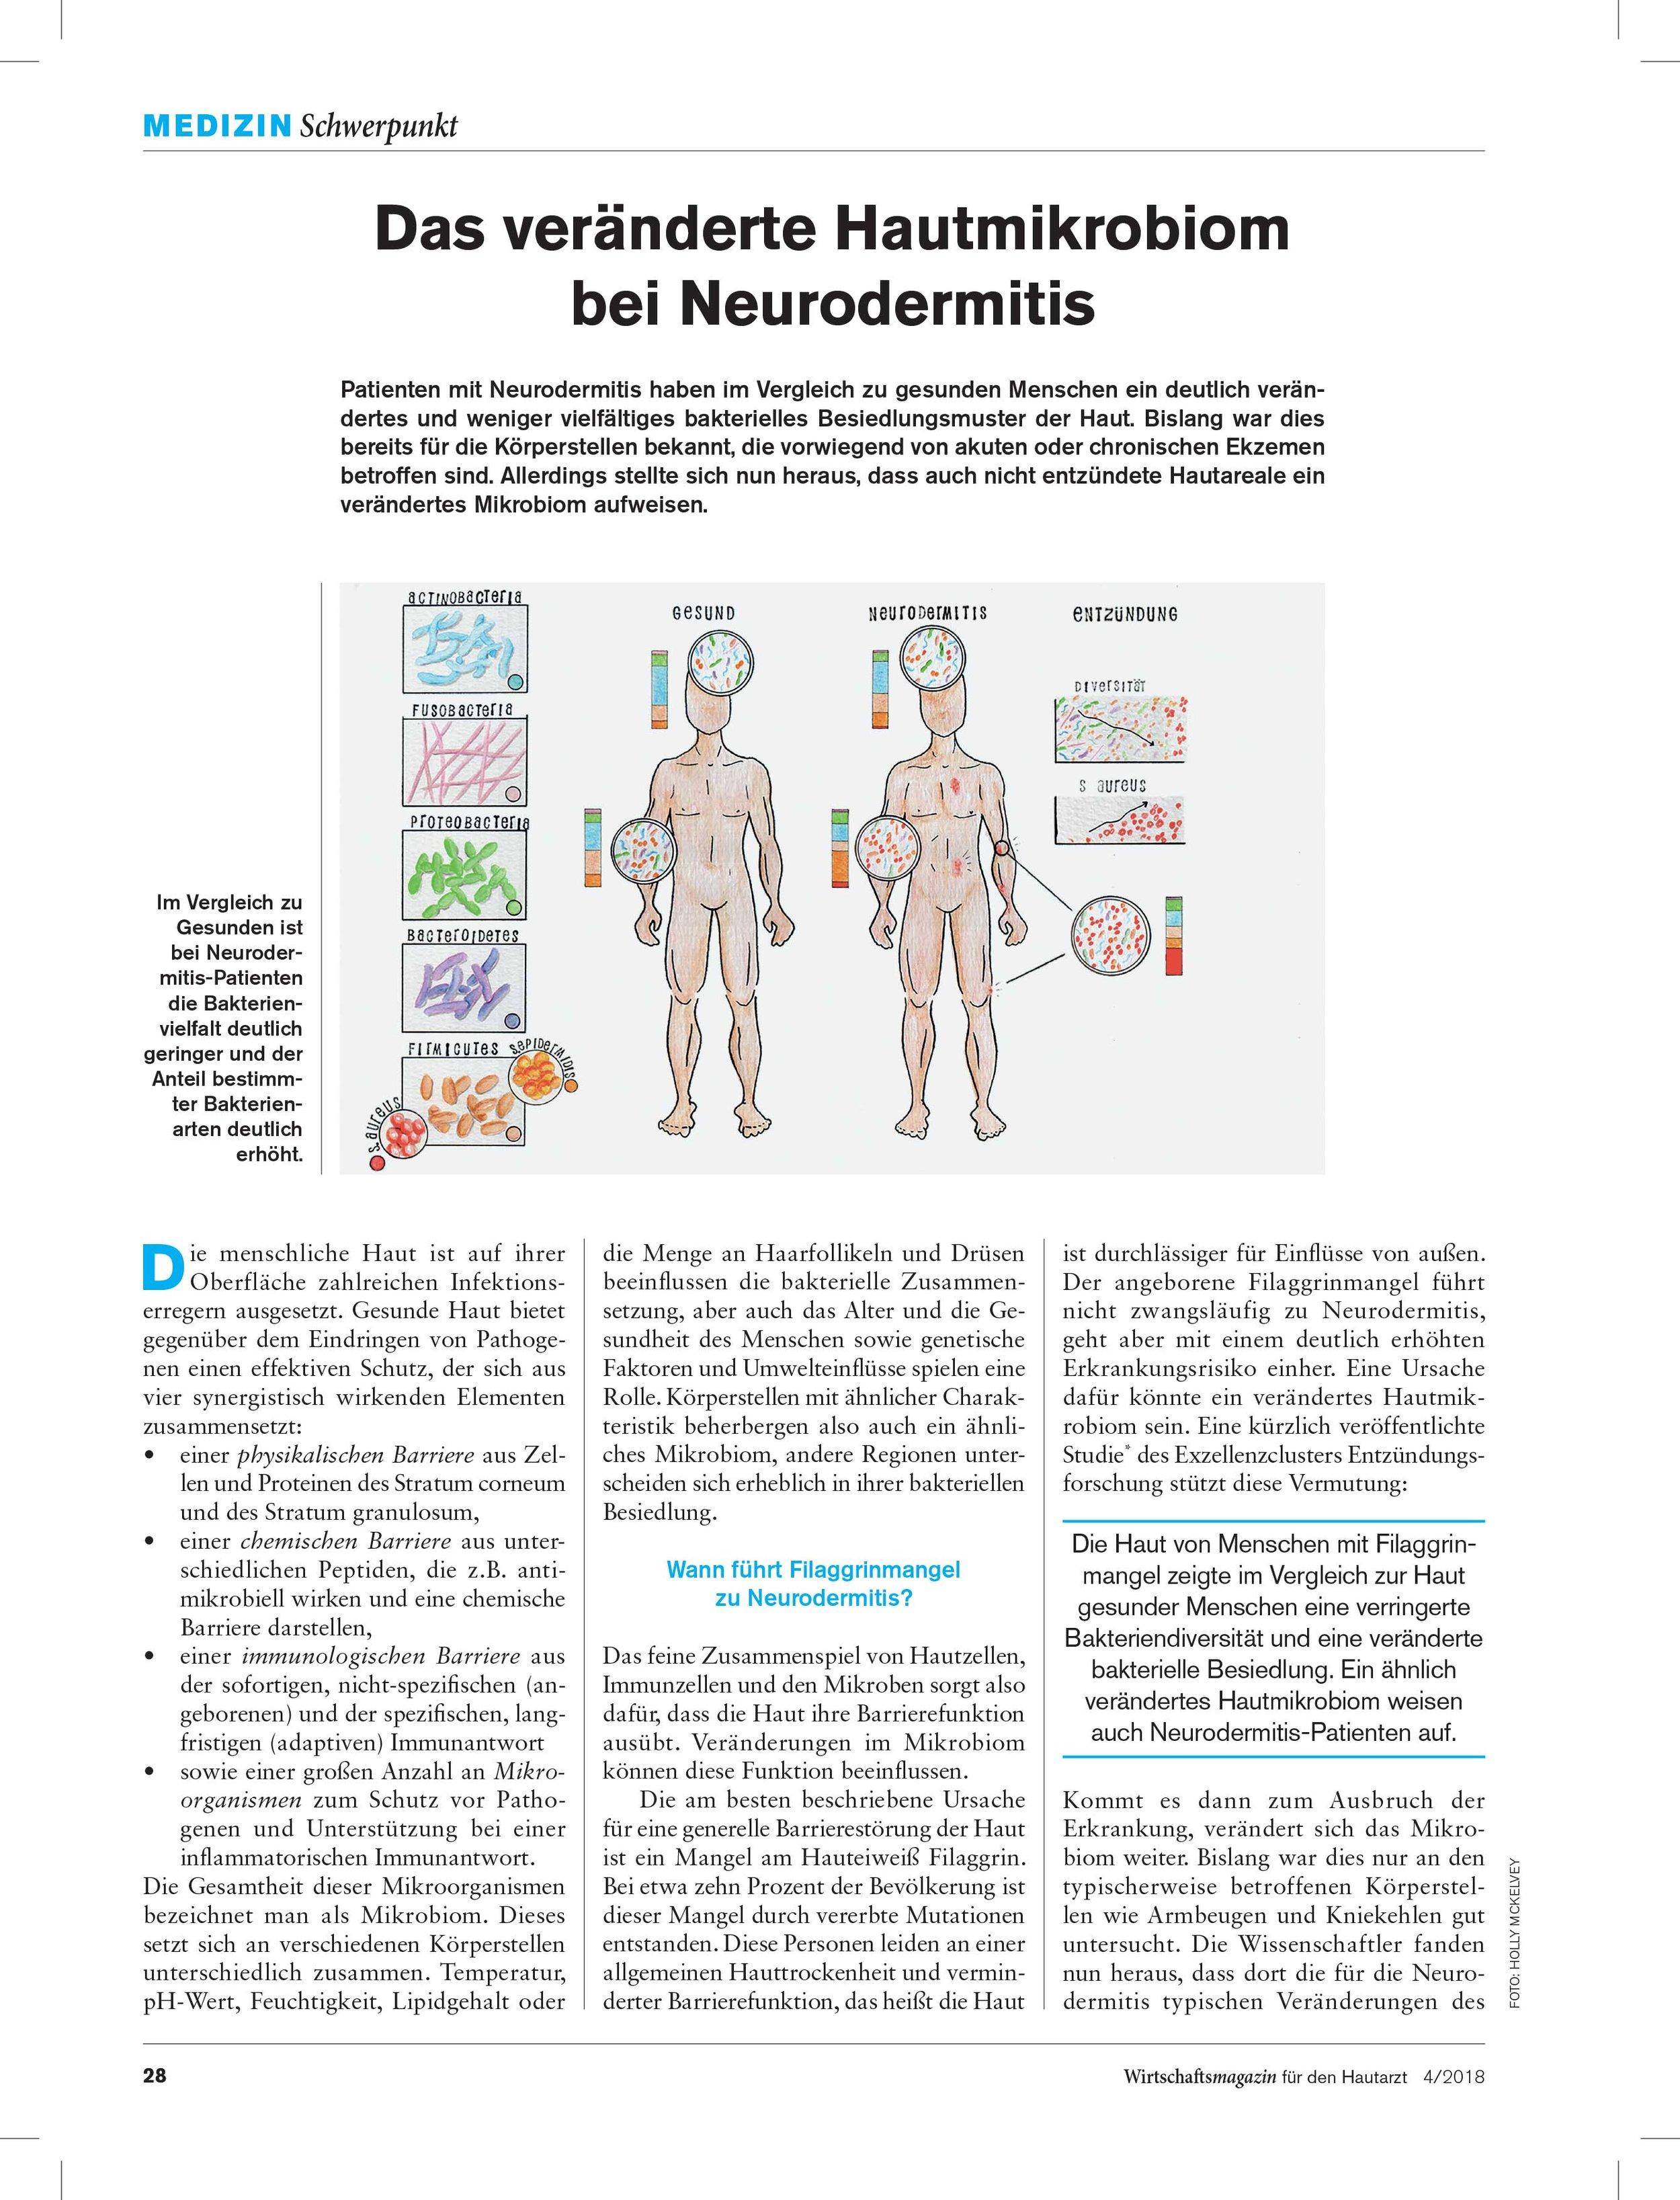 article-p1.jpg